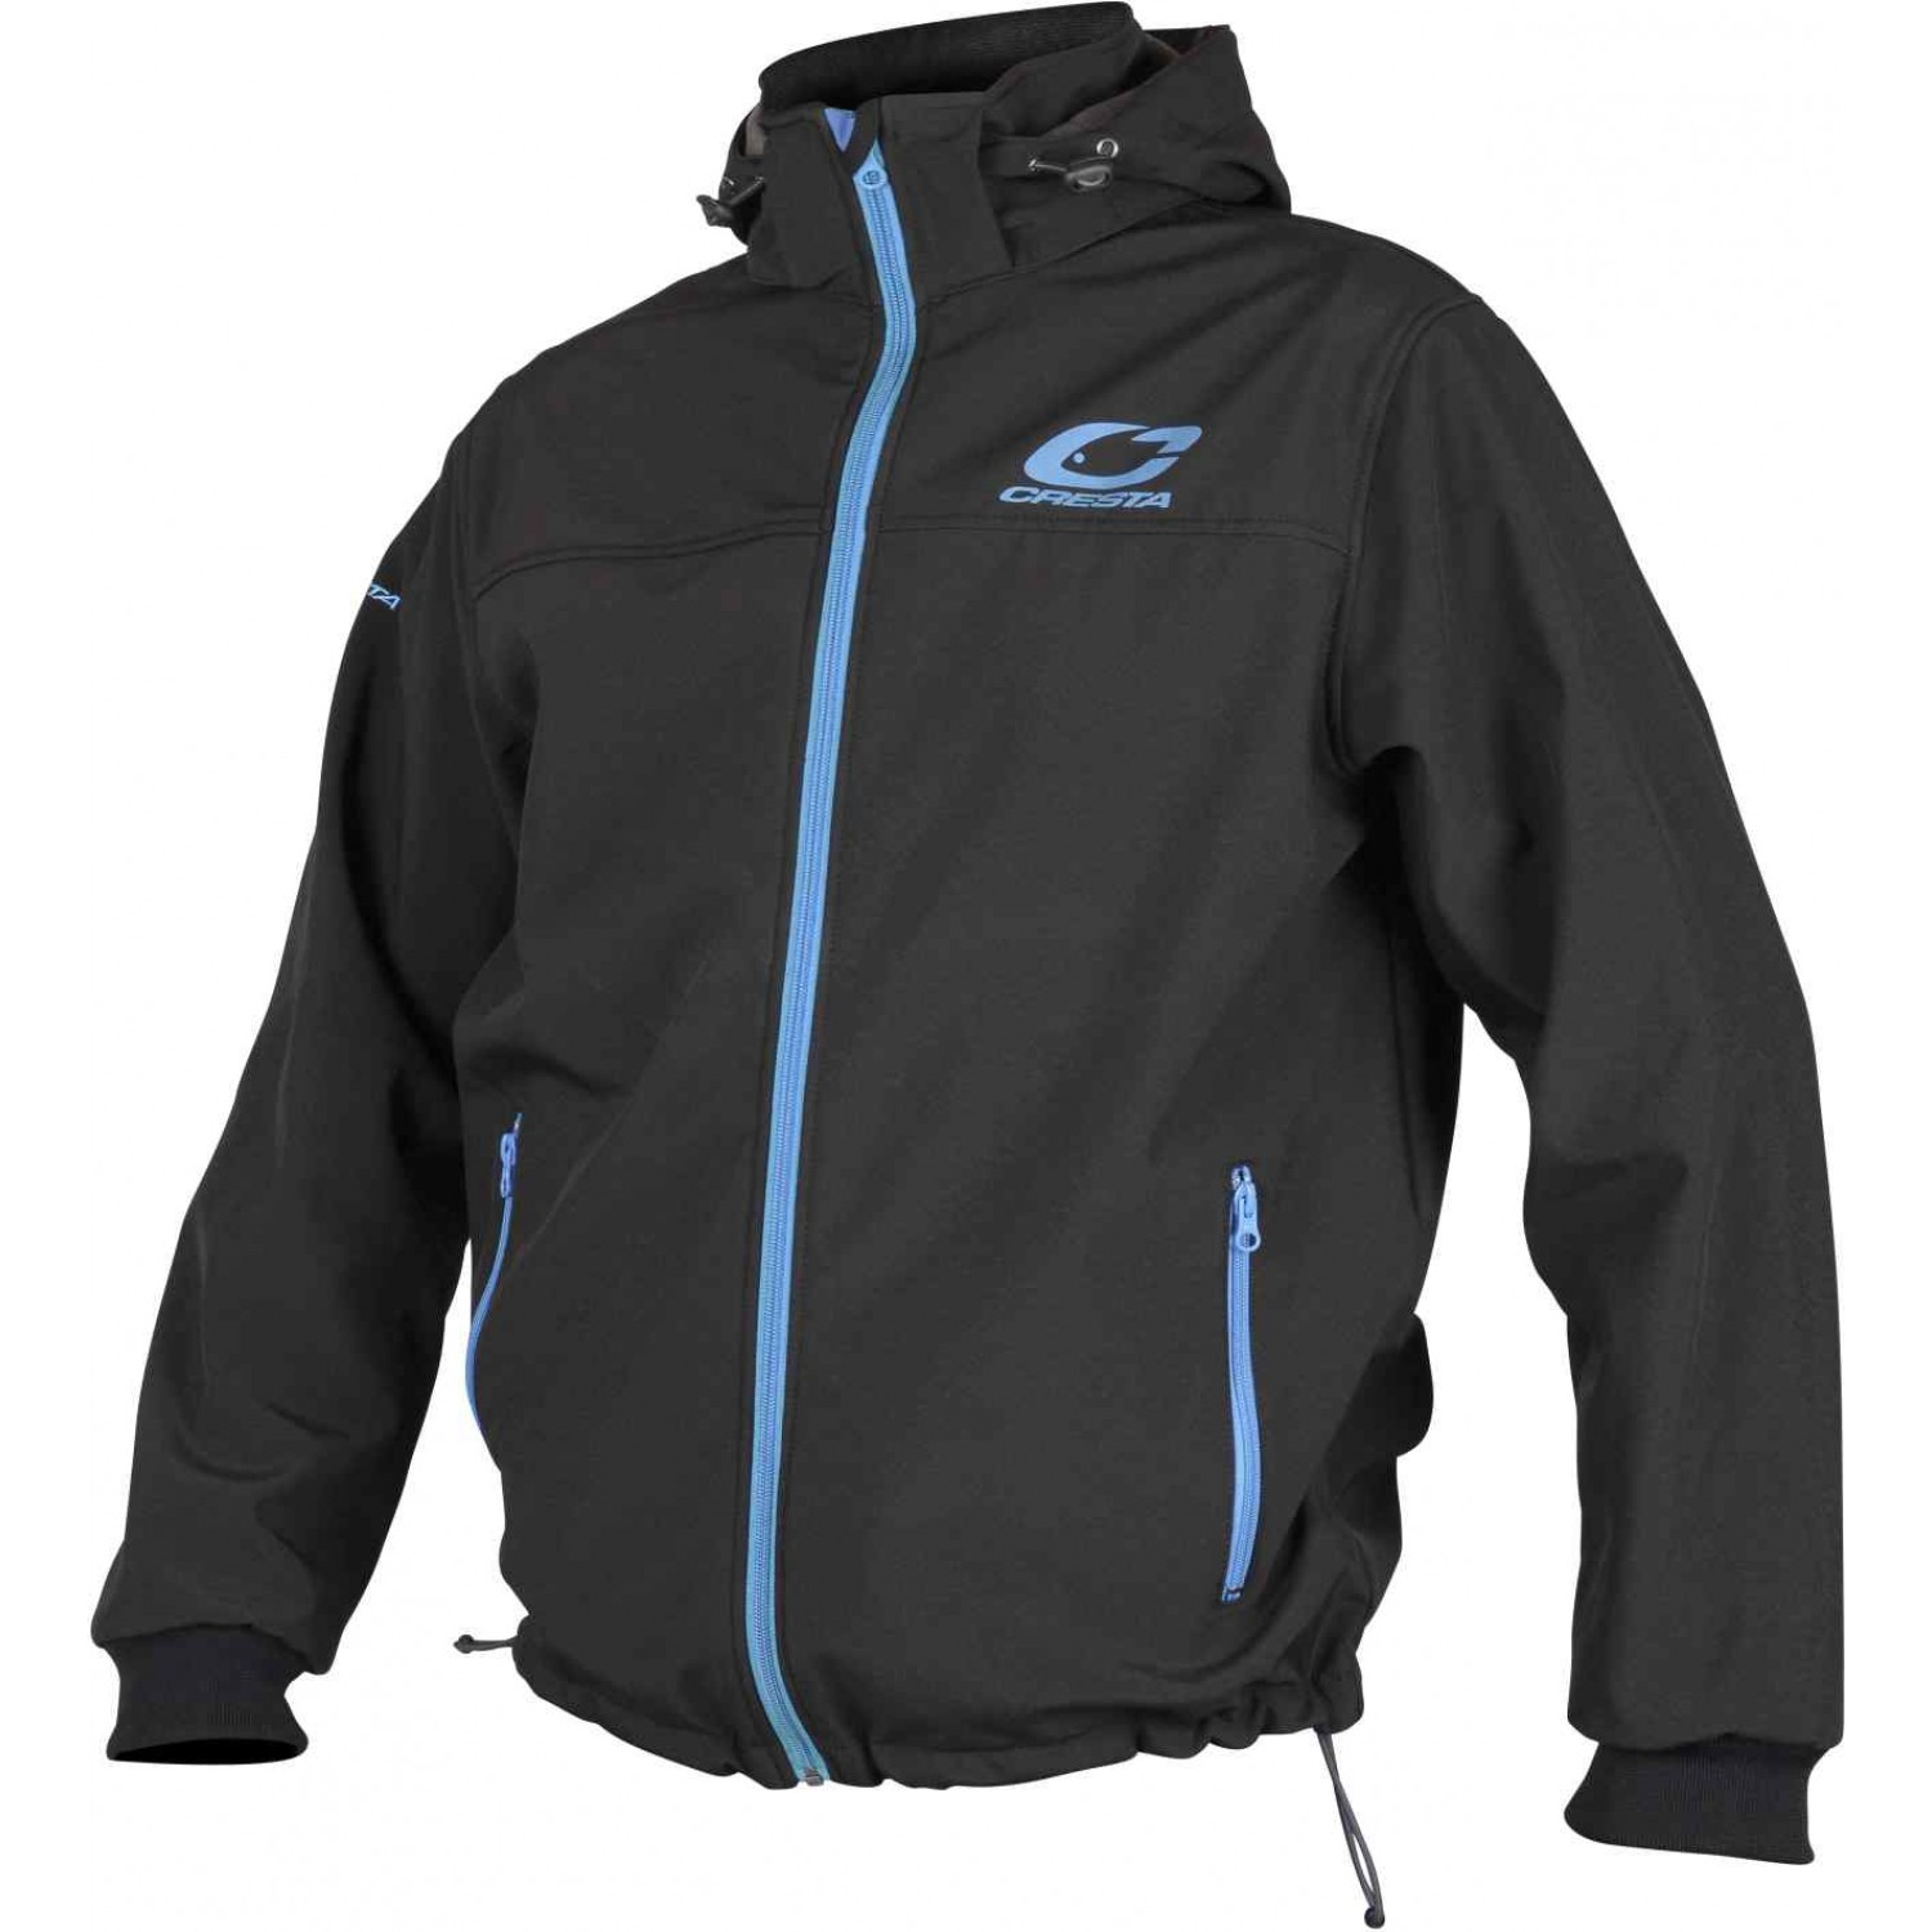 Spro Cresta Soft Shell Jacket, Fishingtackle24 Angelbedarf